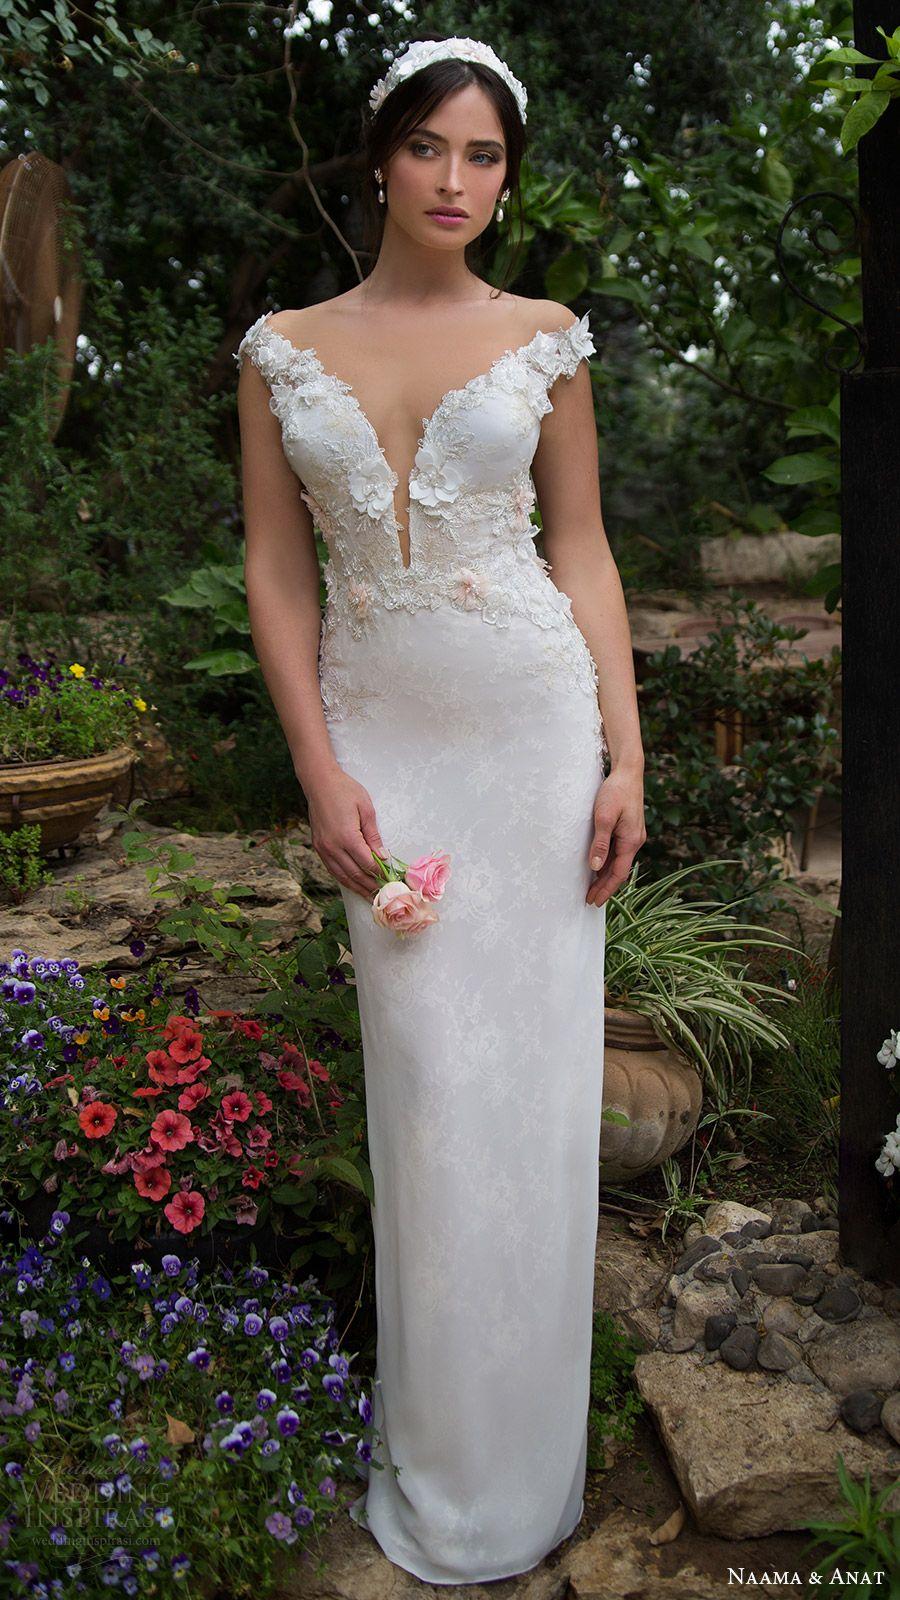 Naama & Anat 2017 Wedding Dresses — Primavera Bridal Collection ...